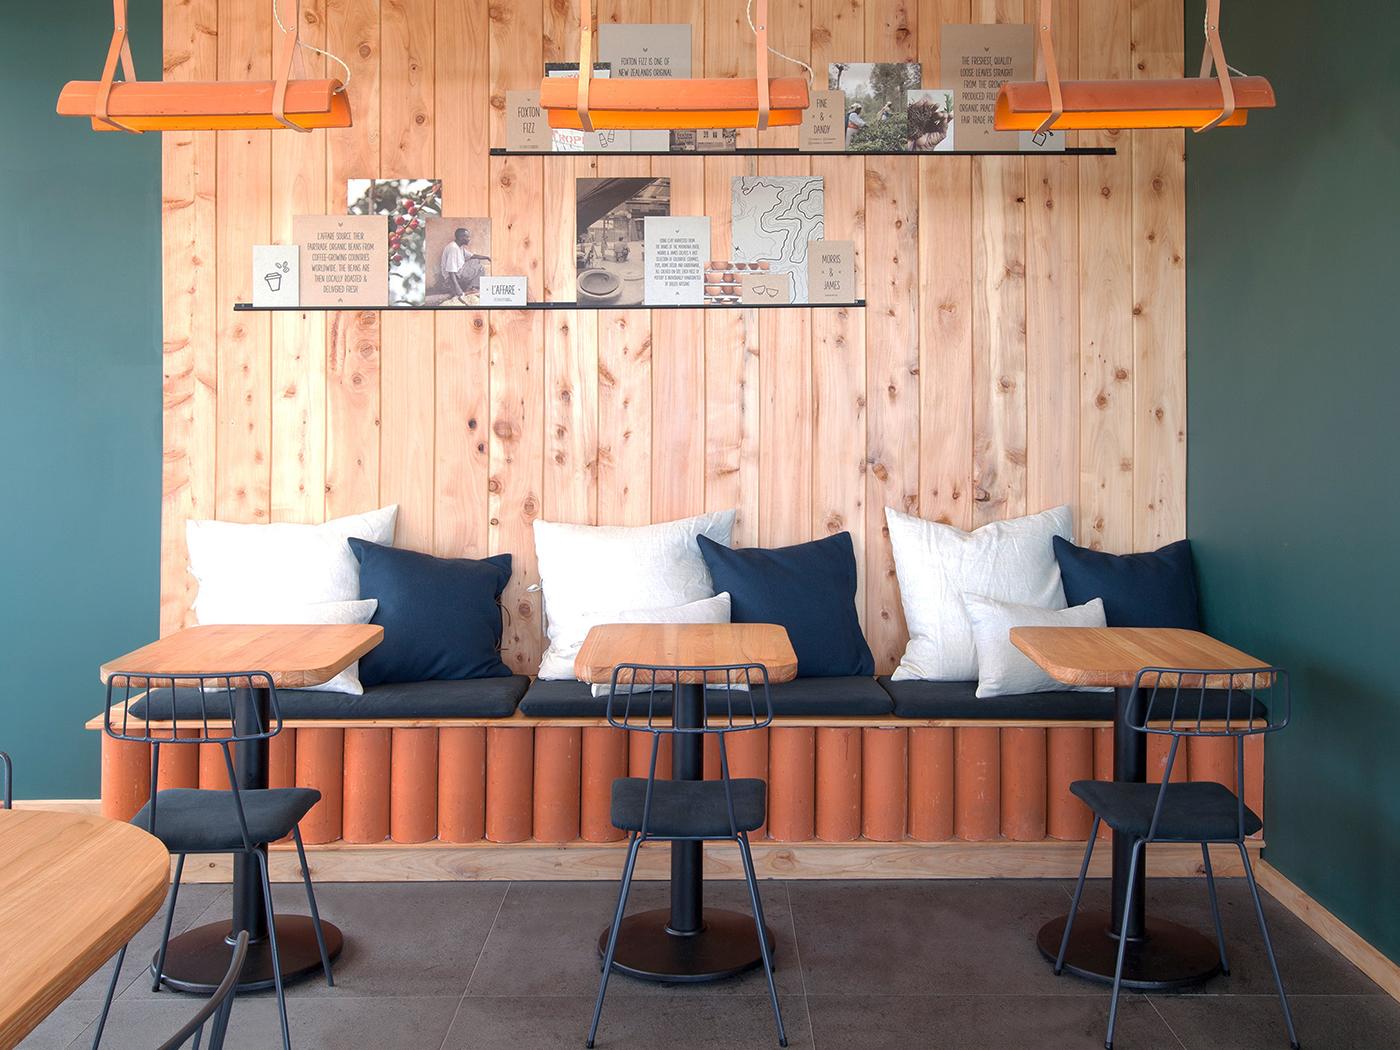 Meet The Source A Hospitality Interior Design With Stunning Features 1 hospitality interior design Meet The Source: A Hospitality Interior Design With Stunning Features Meet The Source A Hospitality Interior Design With Stunning Features 1